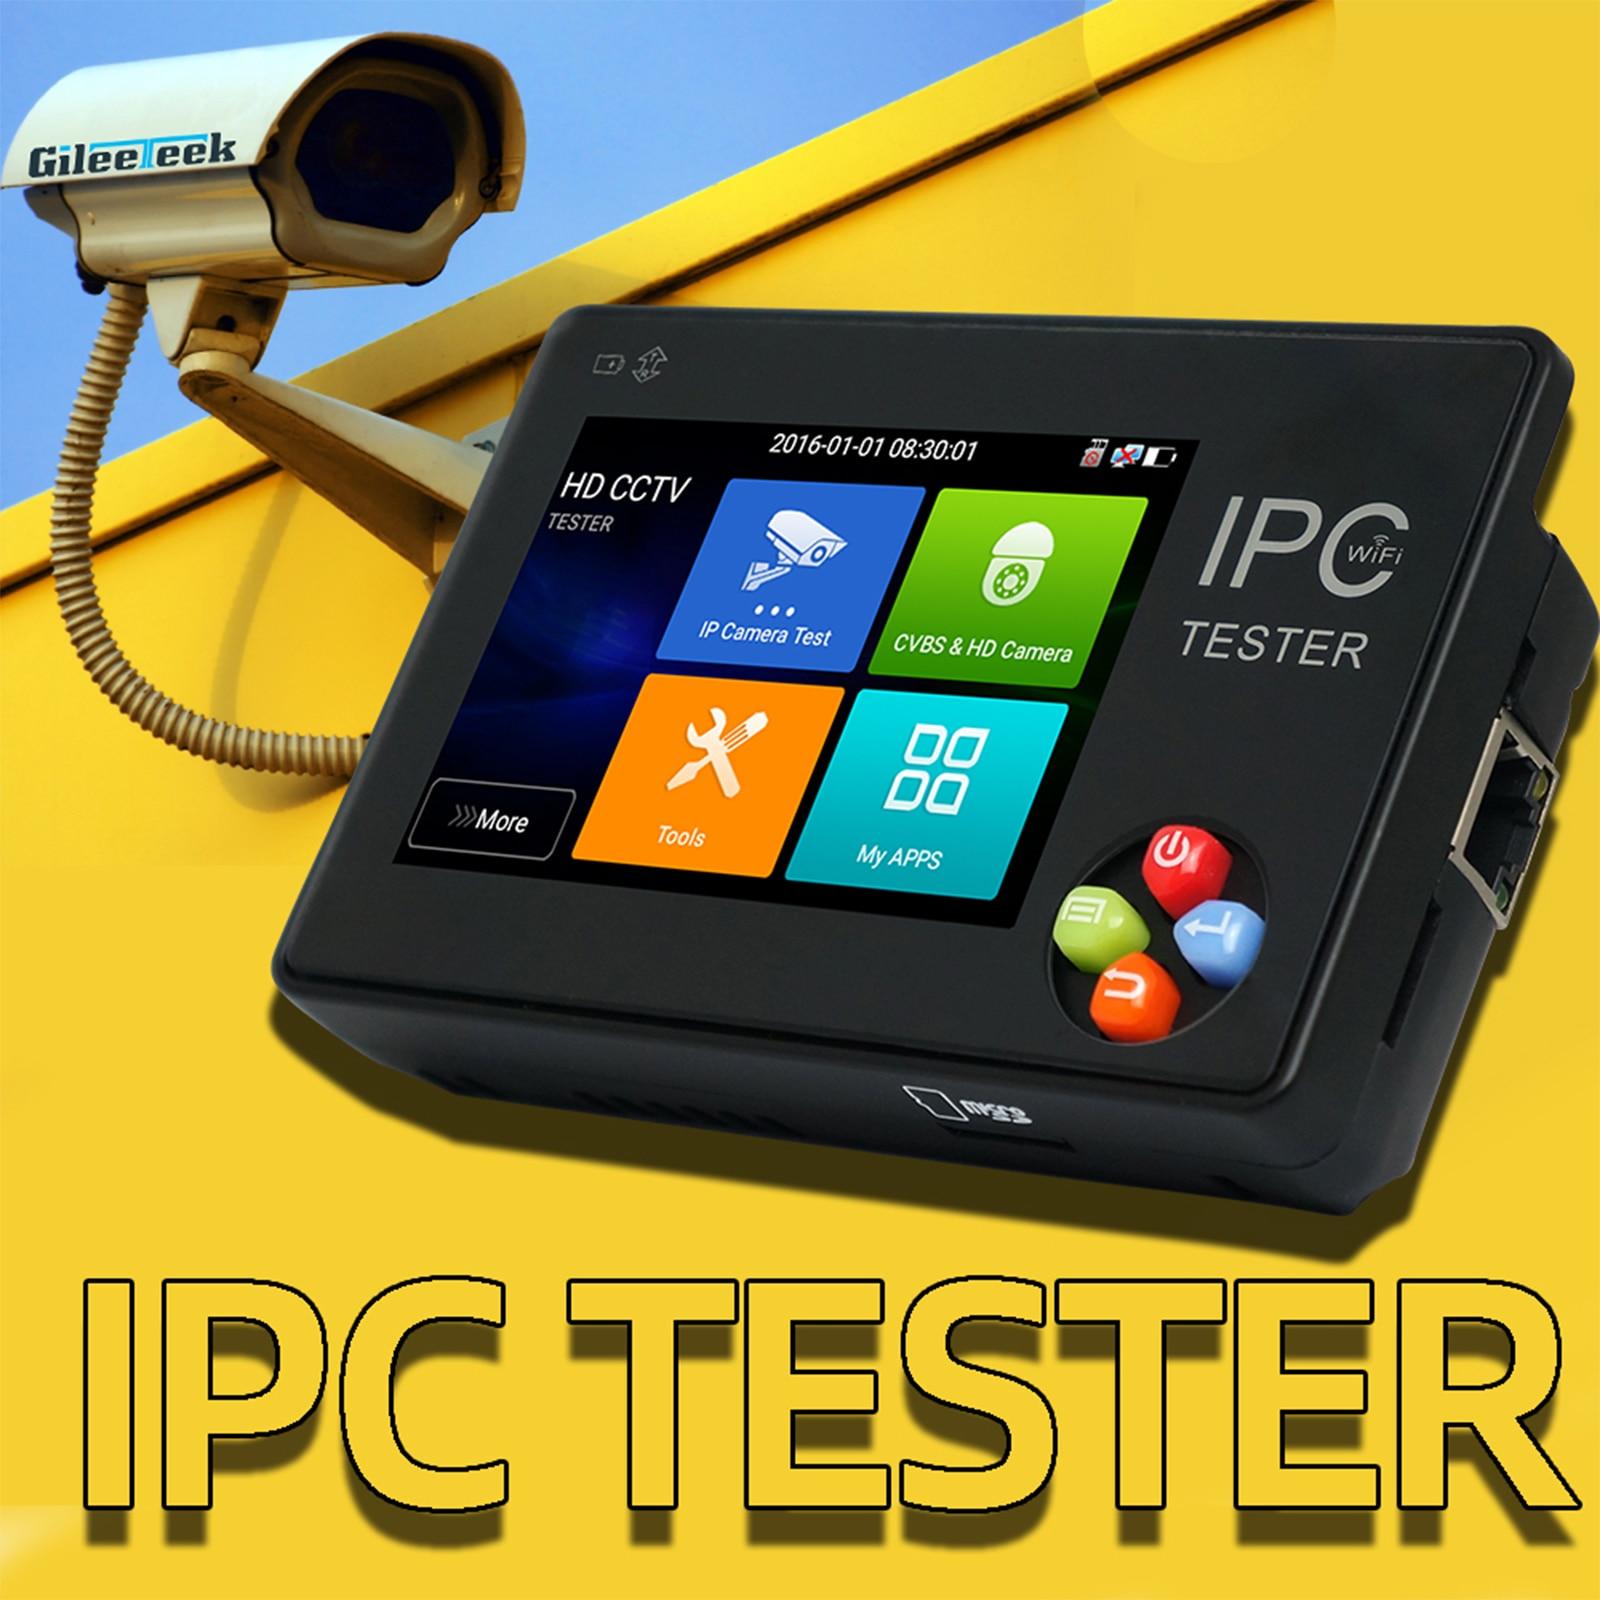 IPC1600AHD plus IPC tester monitor 3.5 inch 4K H.265 IP & CVBS AHD TVI CVI 1080P Camera tester support Rapid ONVIF, IP discoveryIPC1600AHD plus IPC tester monitor 3.5 inch 4K H.265 IP & CVBS AHD TVI CVI 1080P Camera tester support Rapid ONVIF, IP discovery